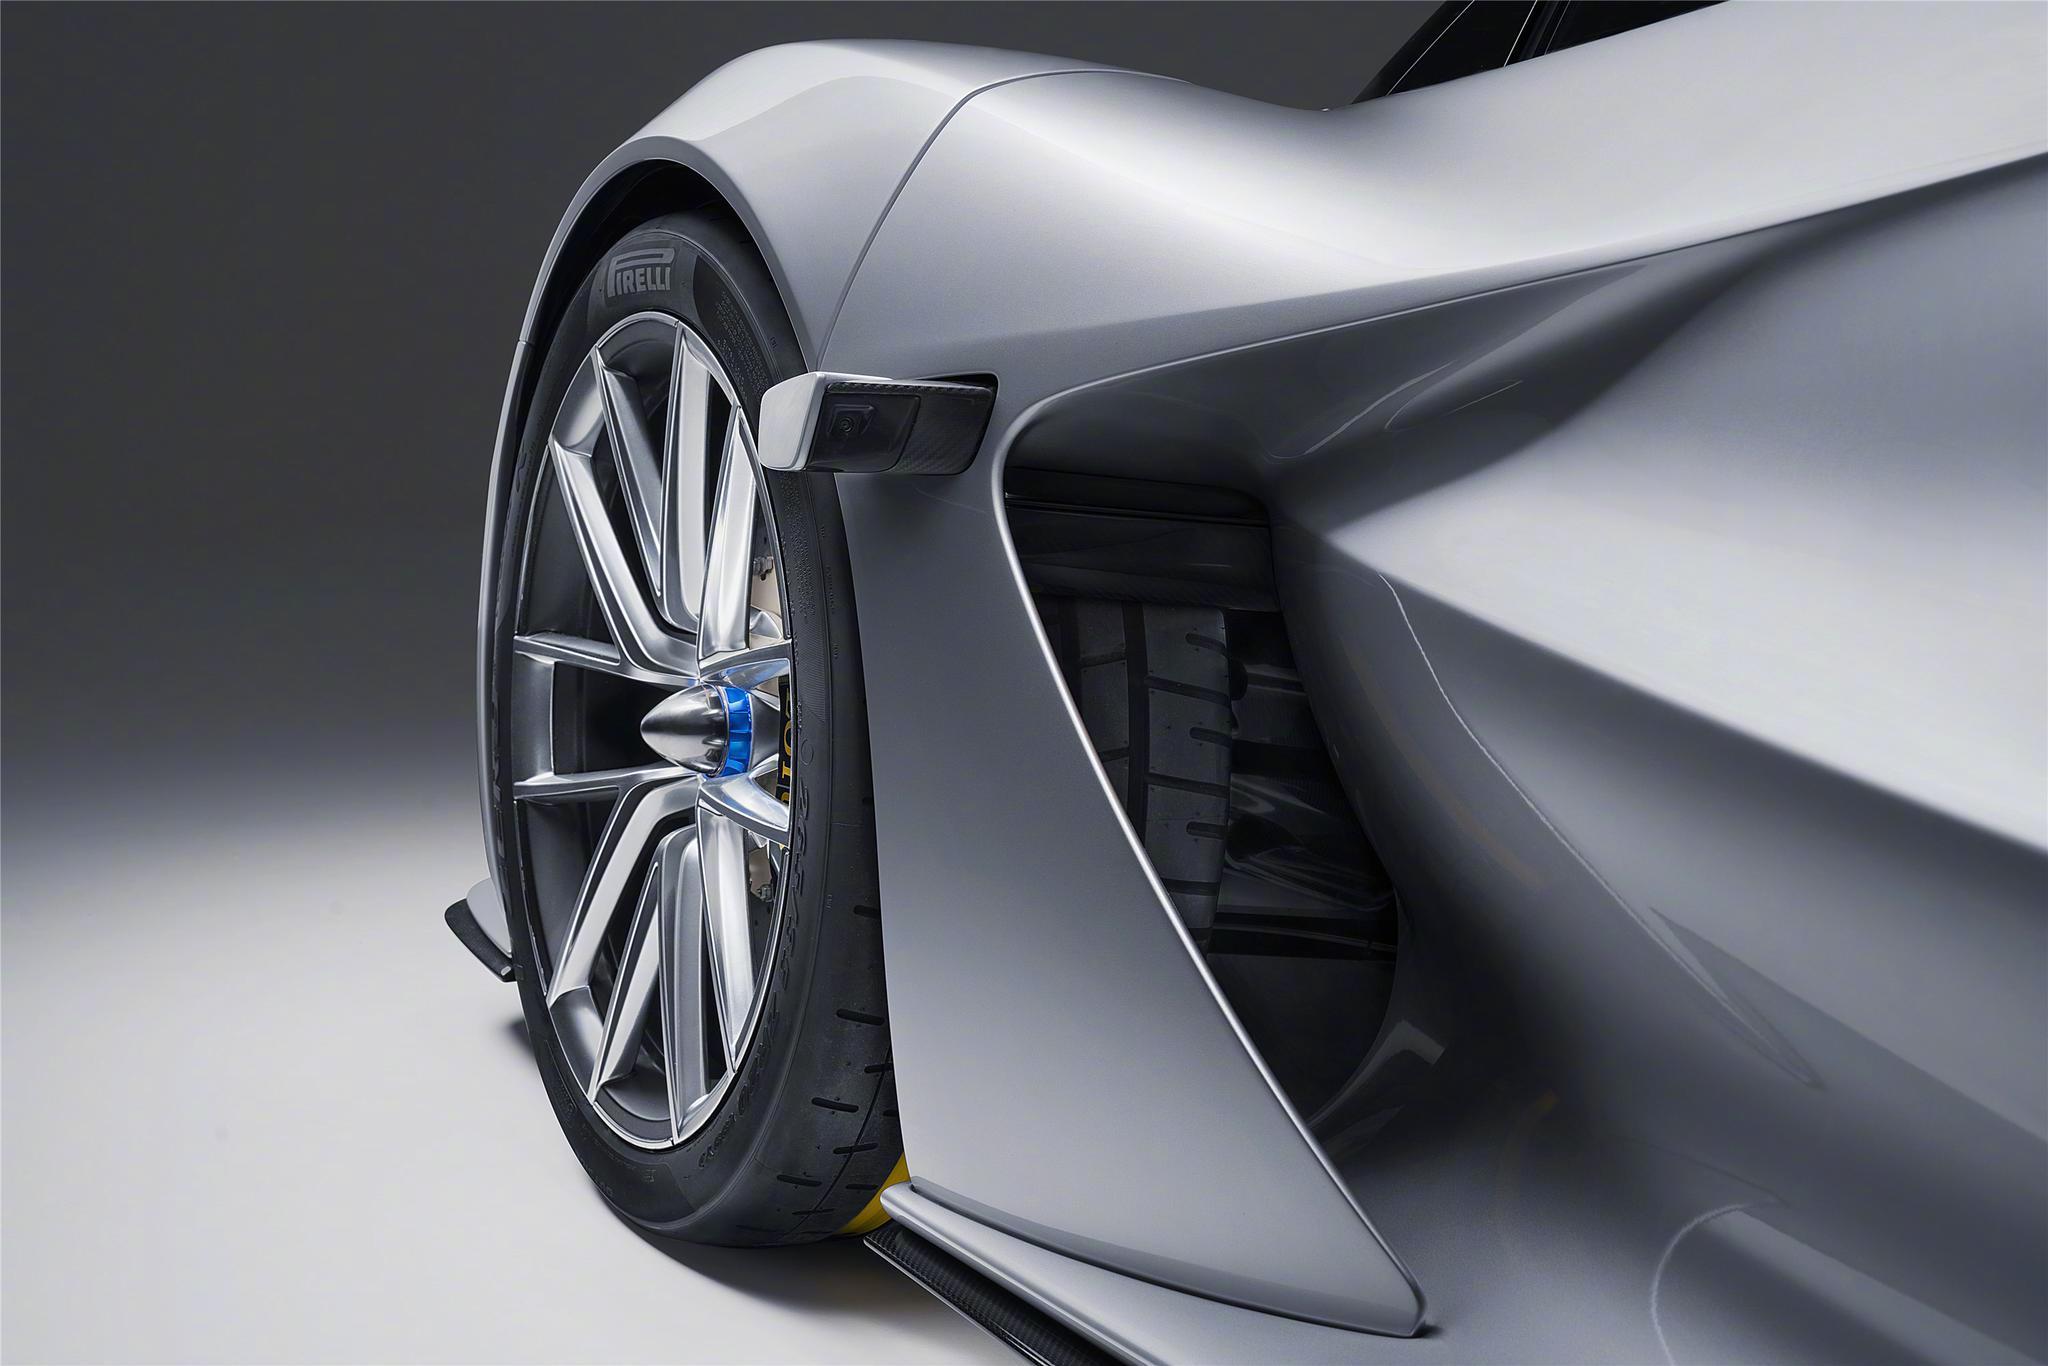 Lotus这个追求极致的疯子,打造出2000马力电动超级跑车Evija